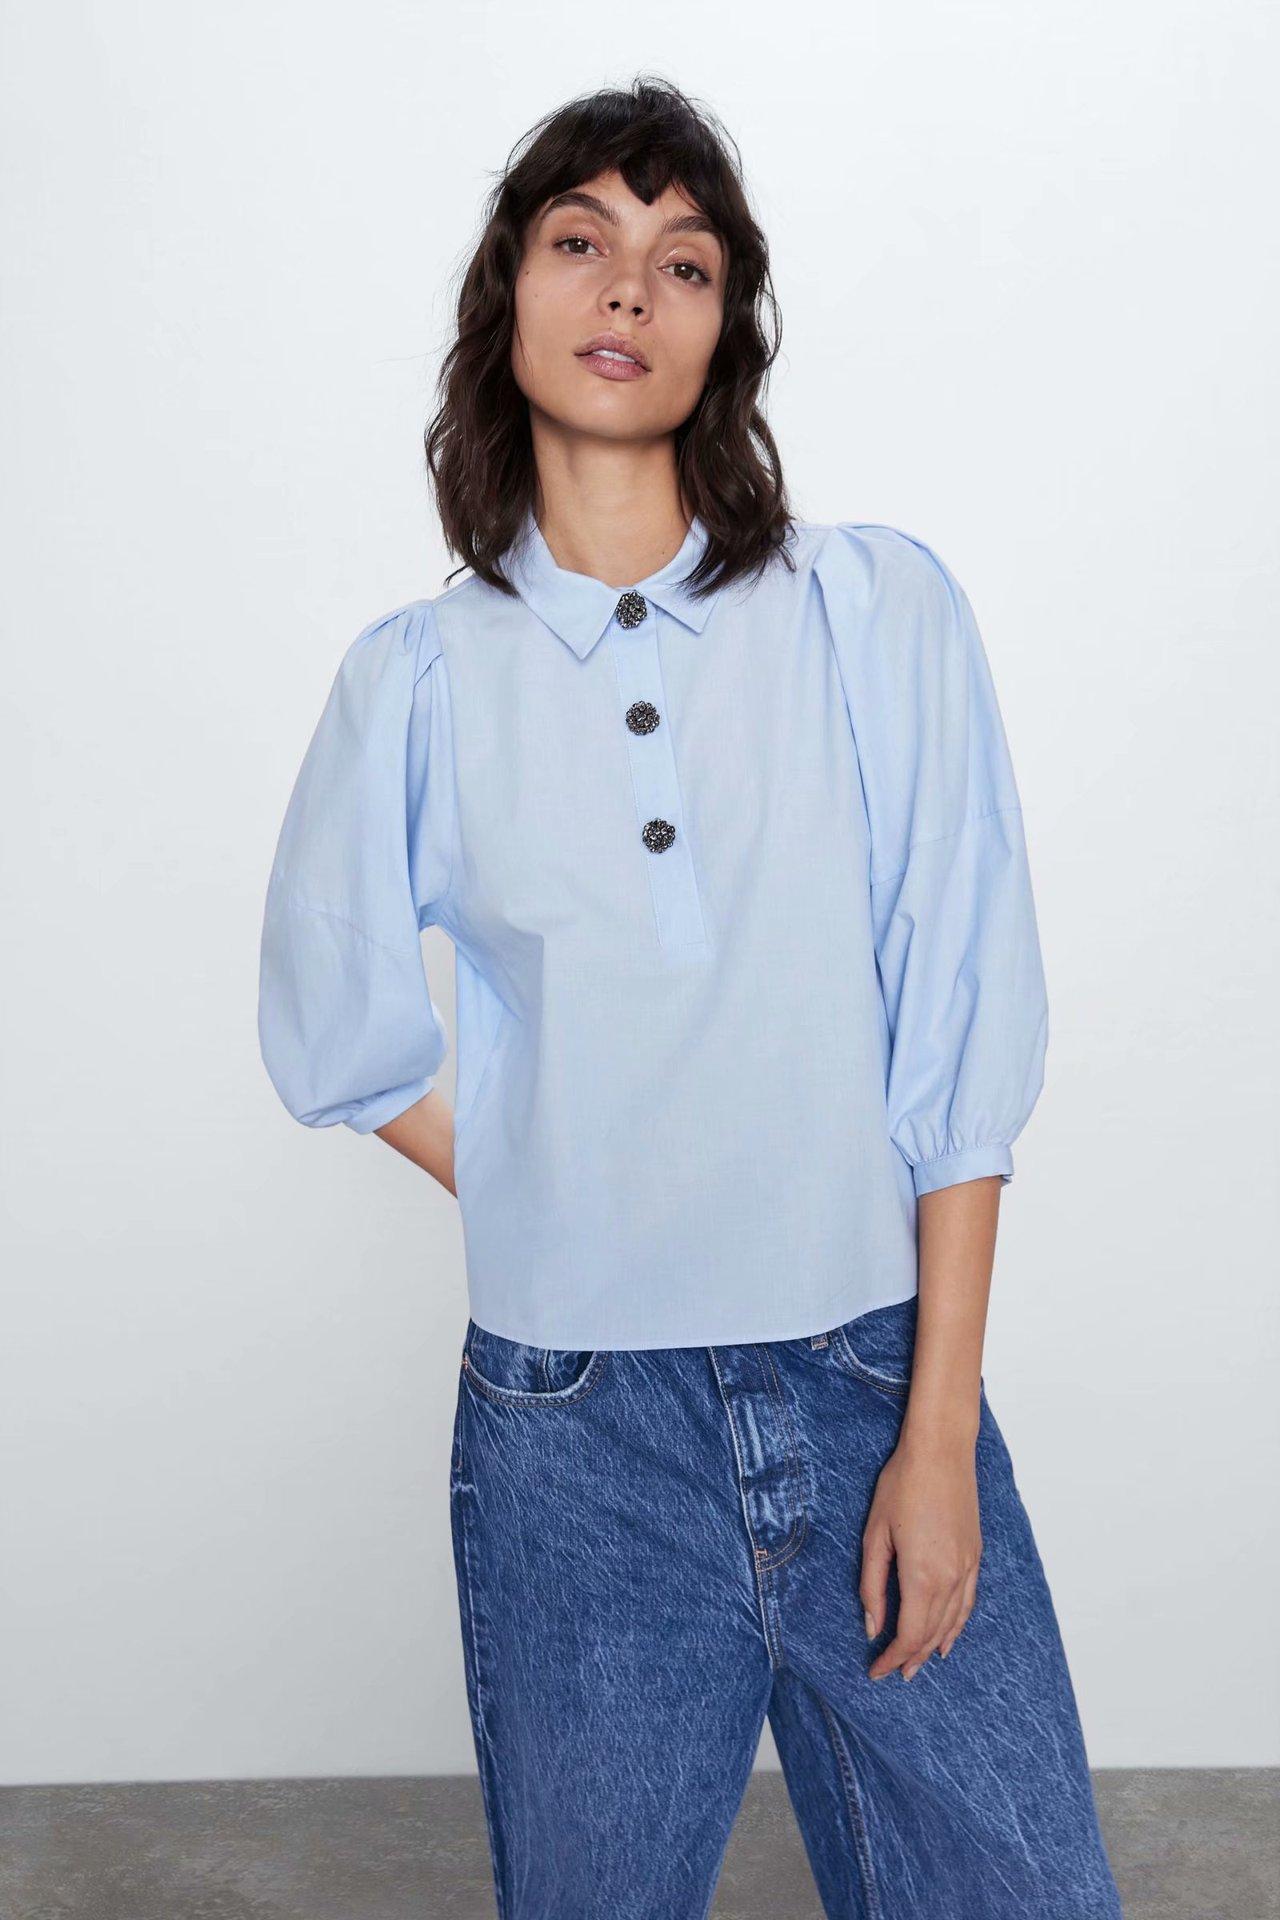 2020 New Spring Summer Cotton European Jewelry Button Streetwear Female Shirt Zaraing Vadiming Sheining Women Shirt HJH2792